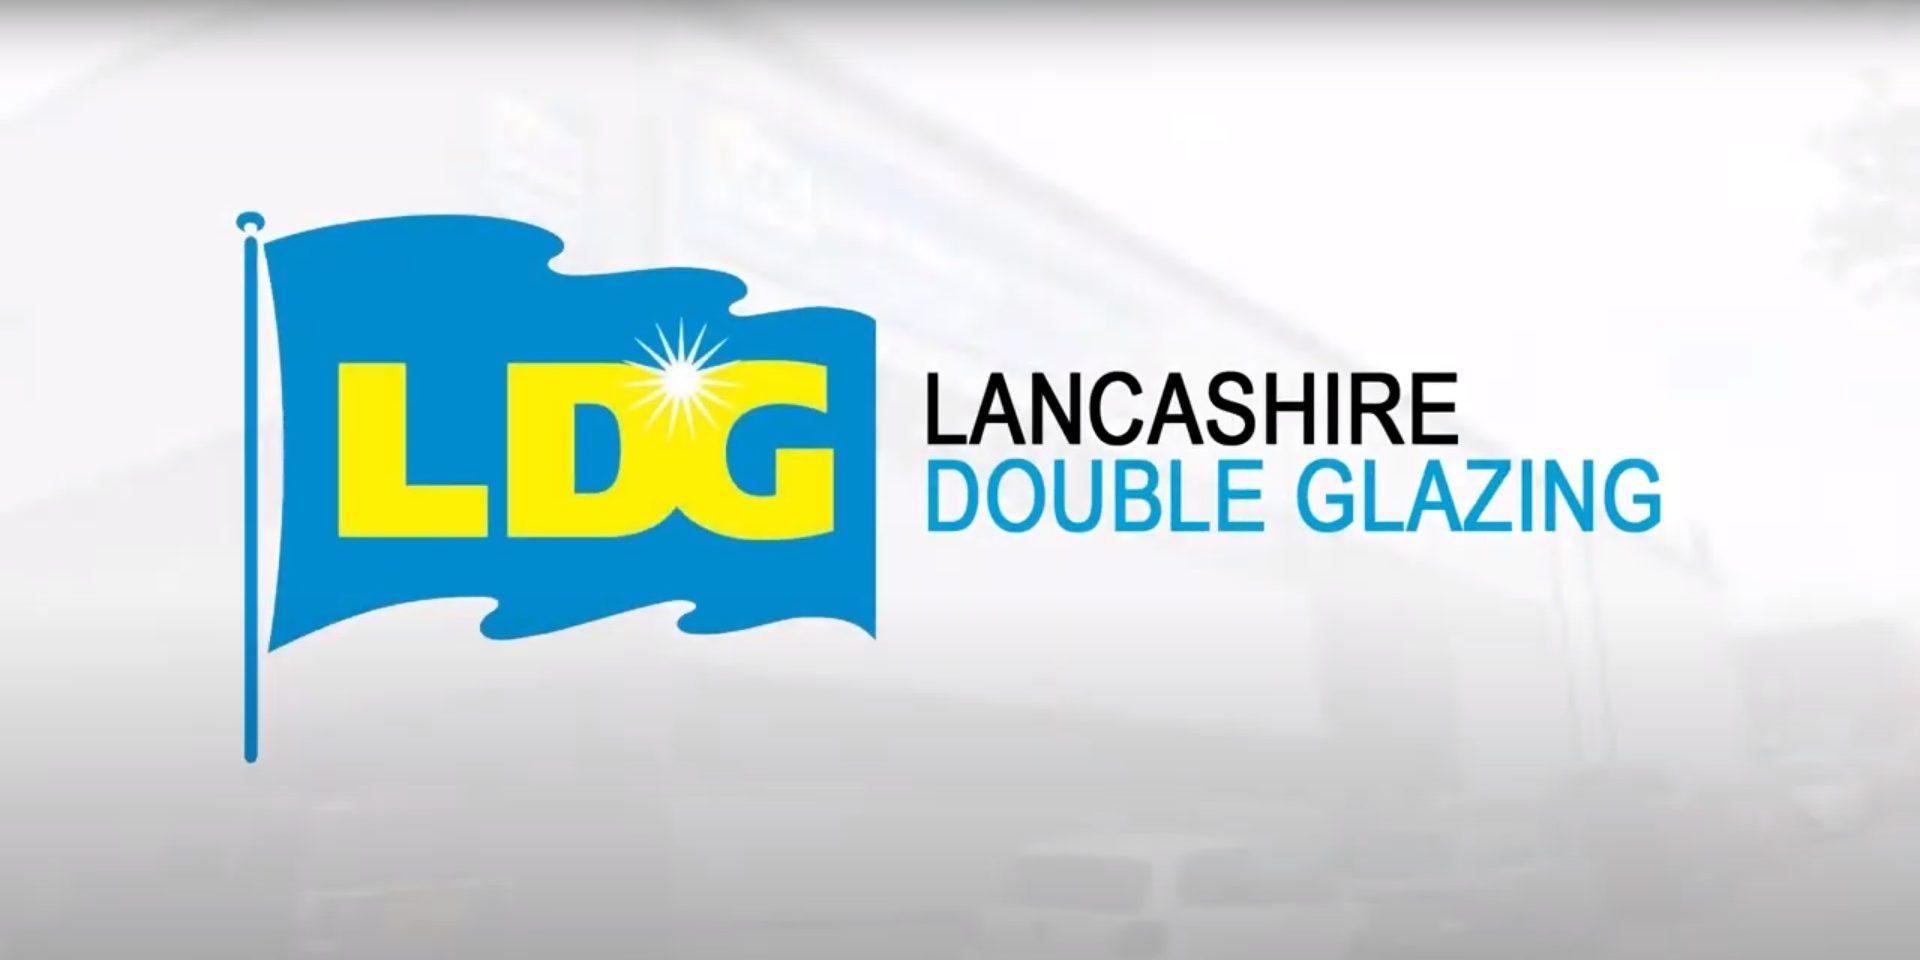 lancashire-double-glazing-video